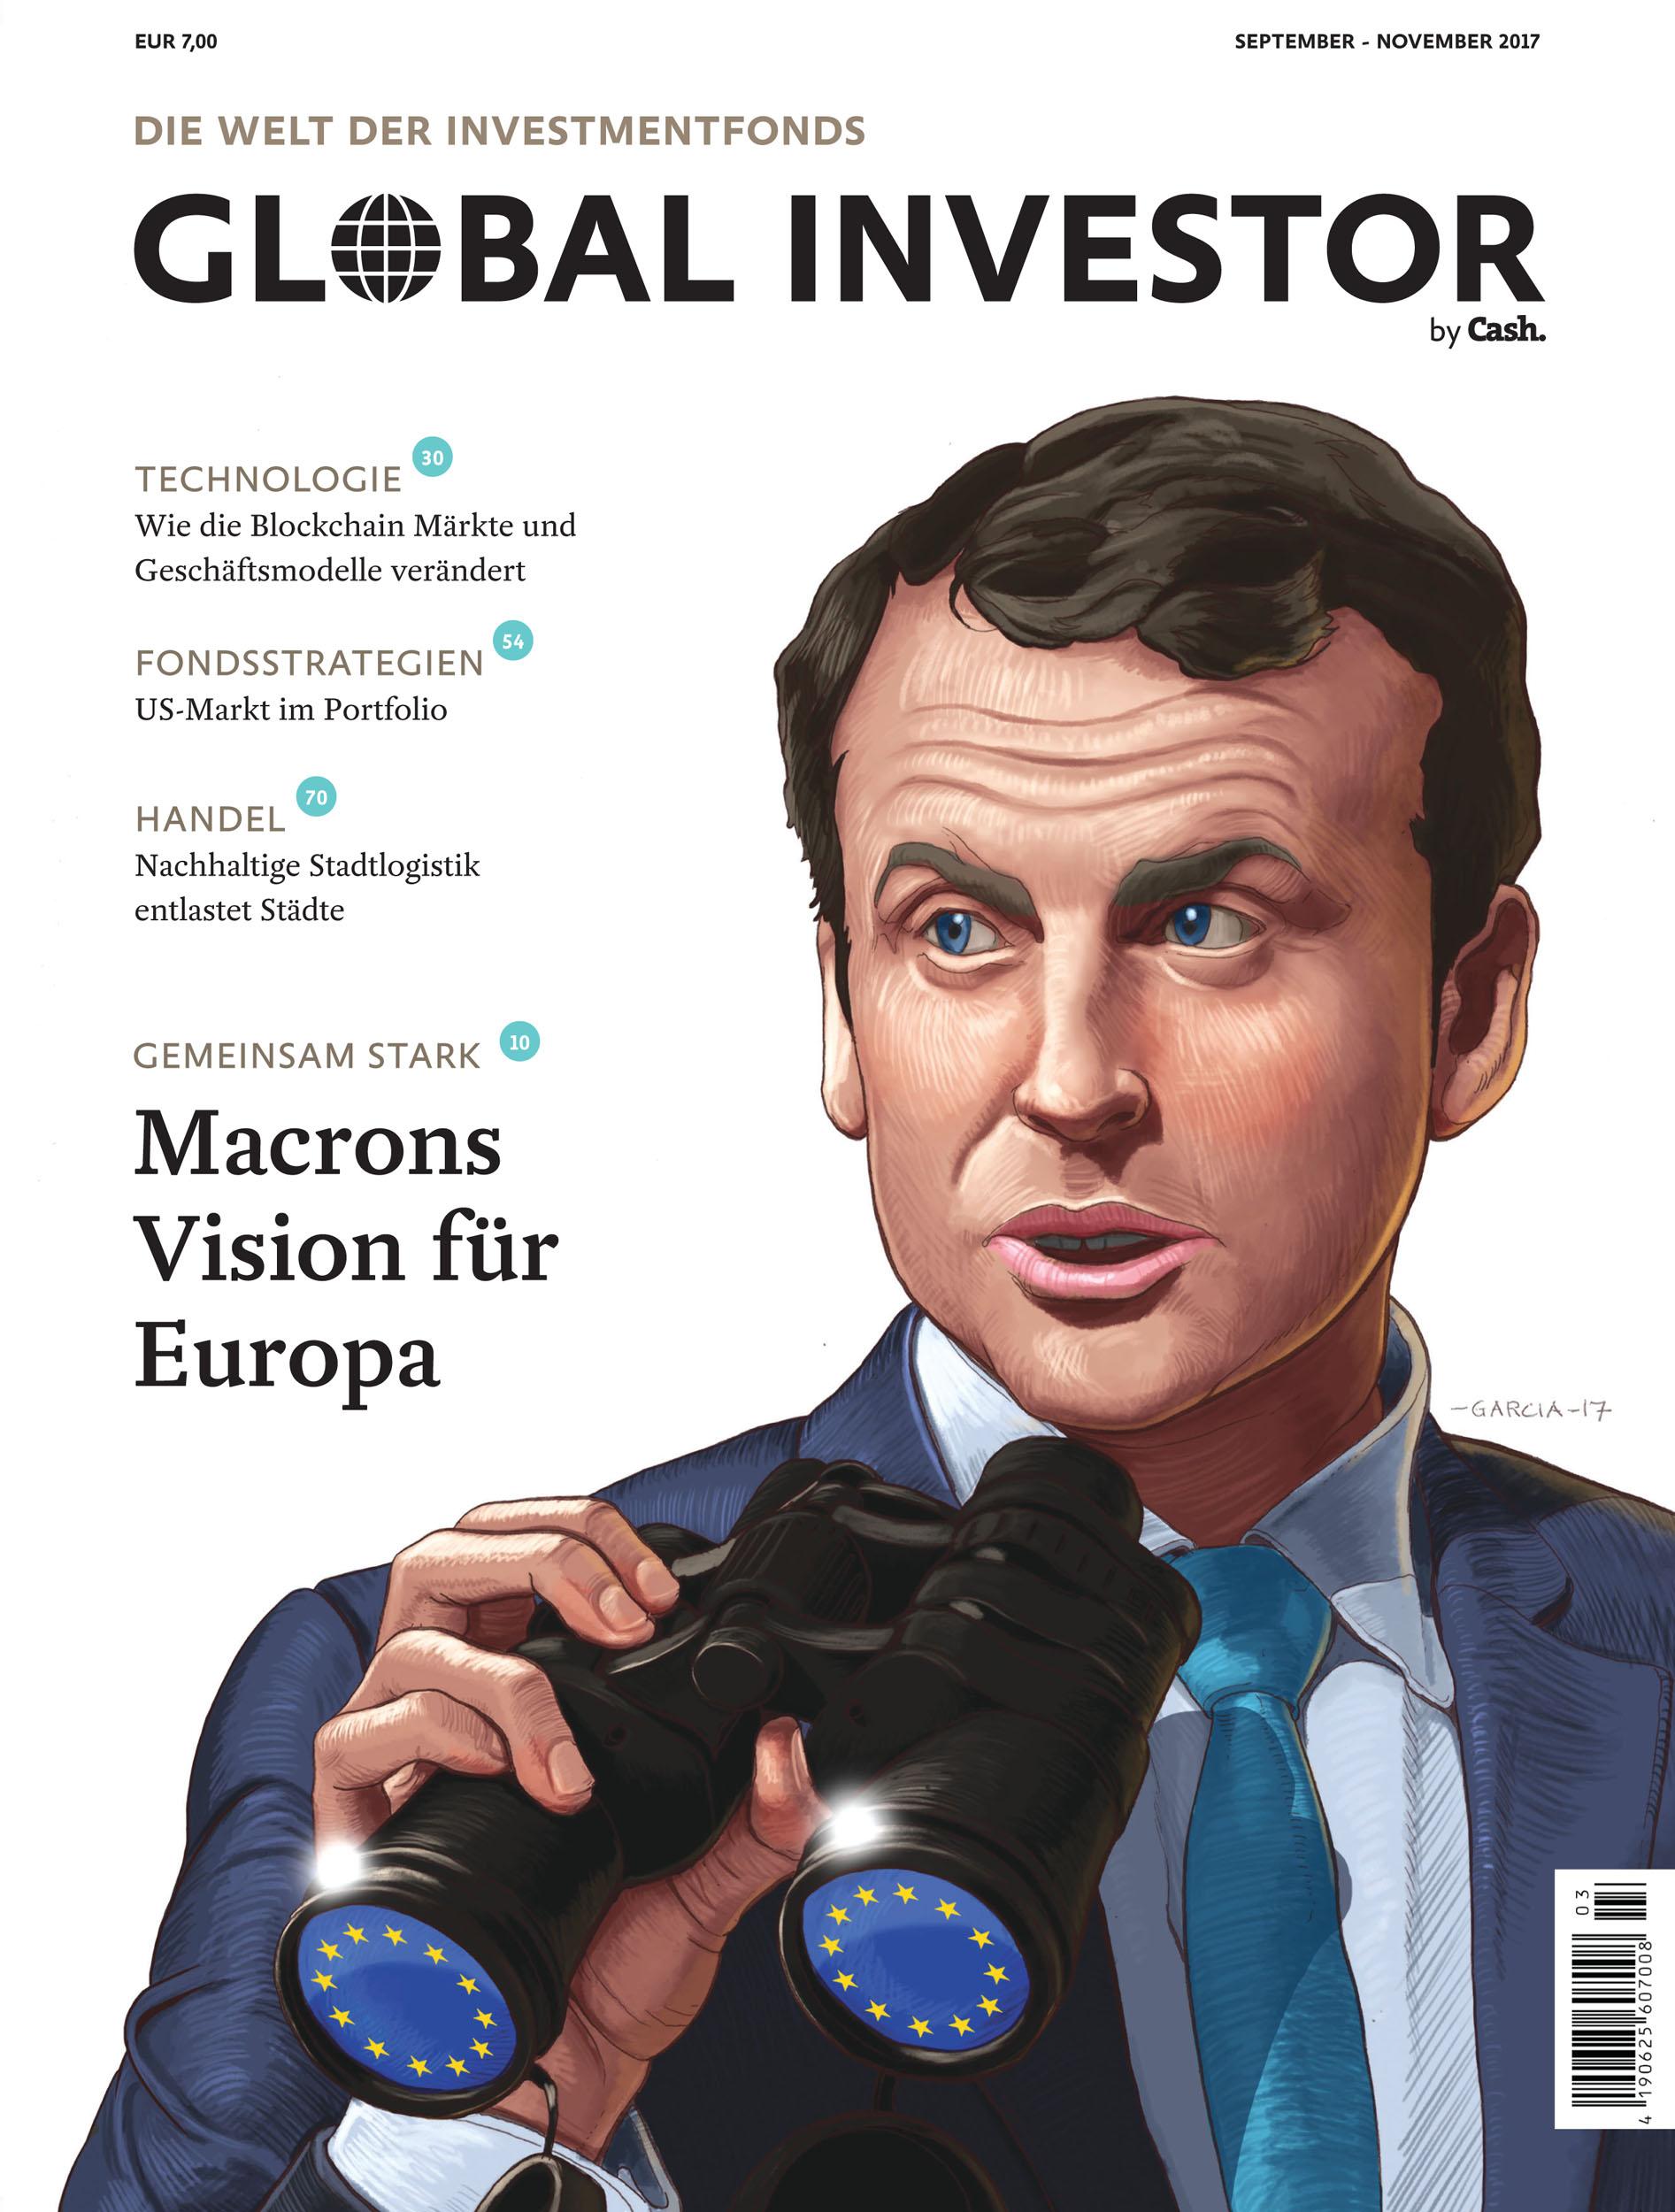 Daniel Garcia Art Illustration Macron Europe Vision Magazine Cover Illustration Cartoon Caricature 01